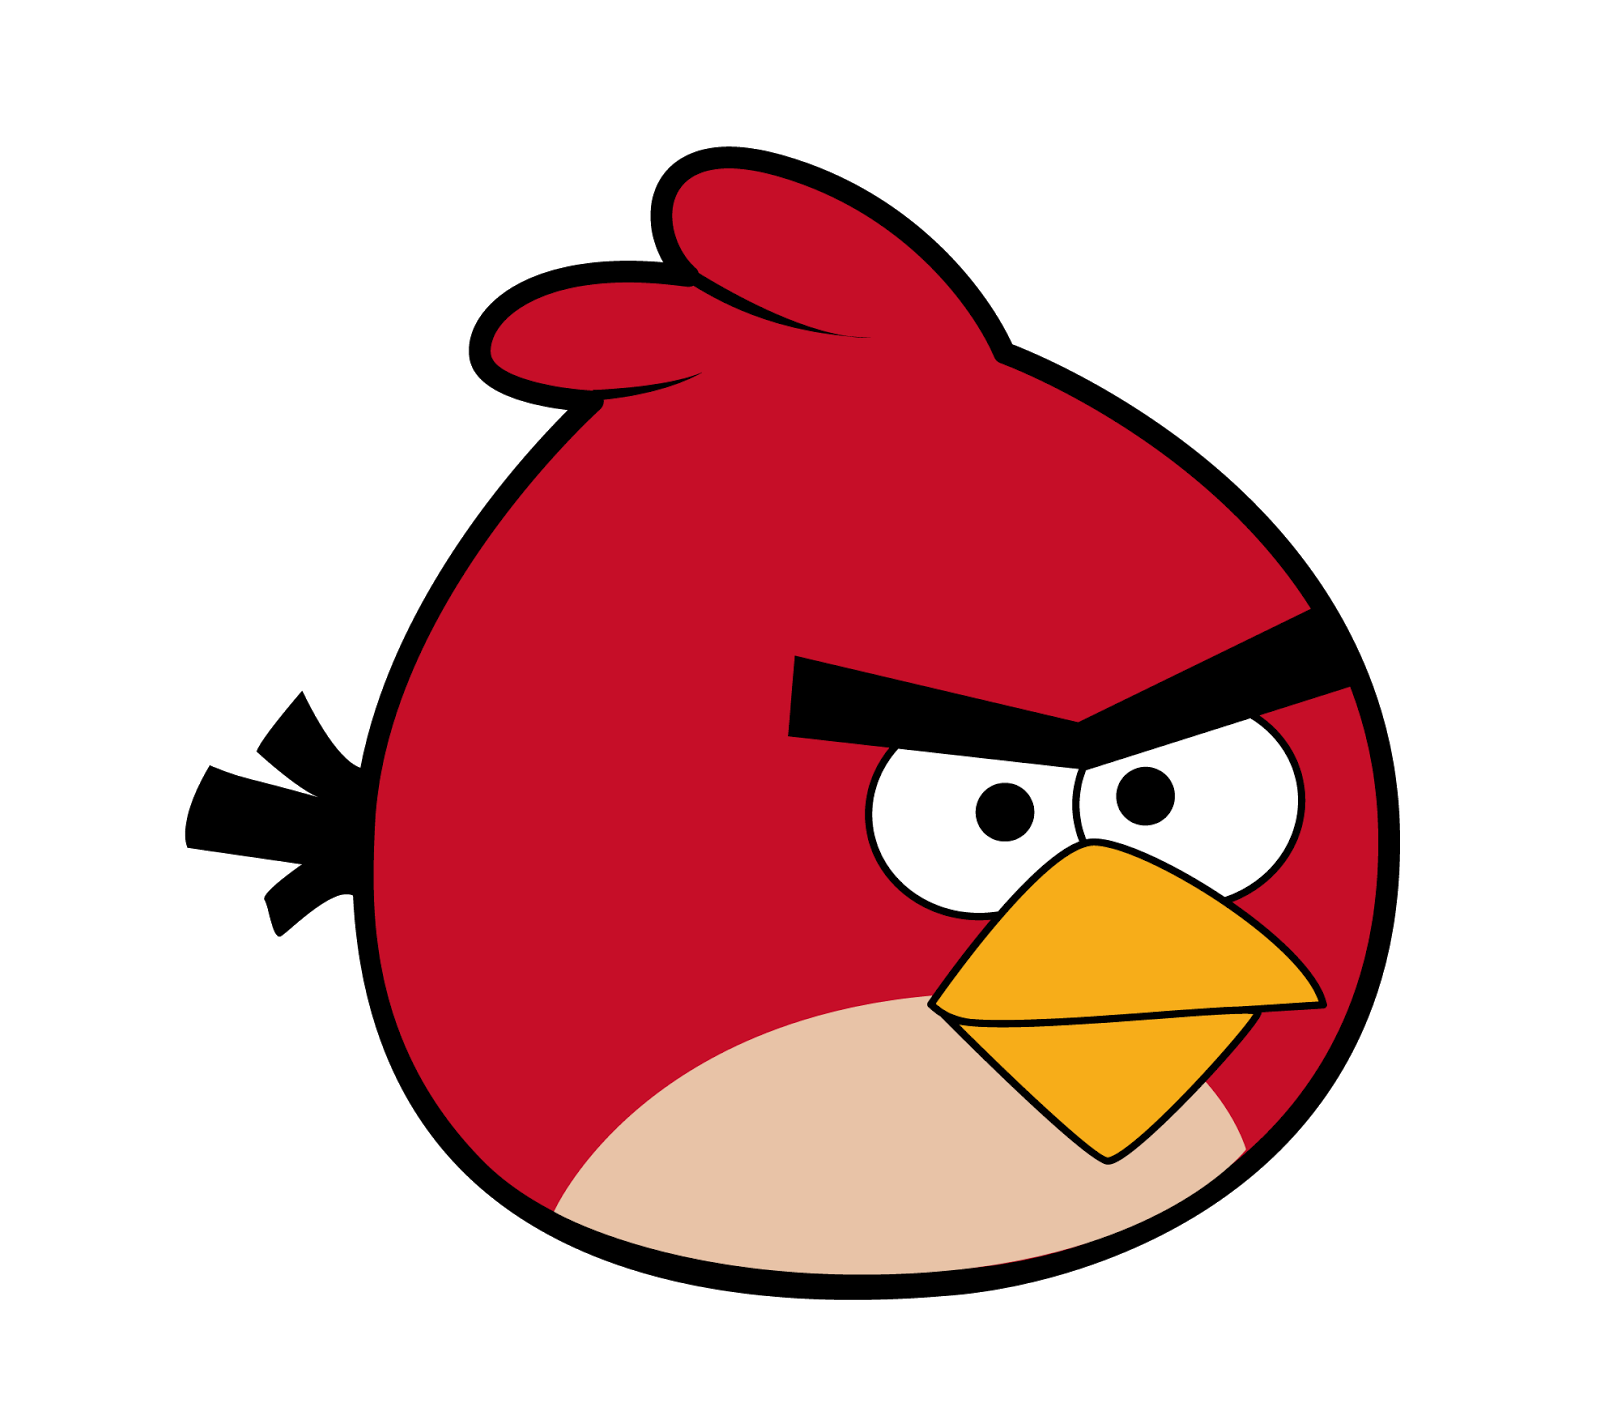 Kit Festa Angry Birds para imprimir   angry bird   Pinterest   Angry ...